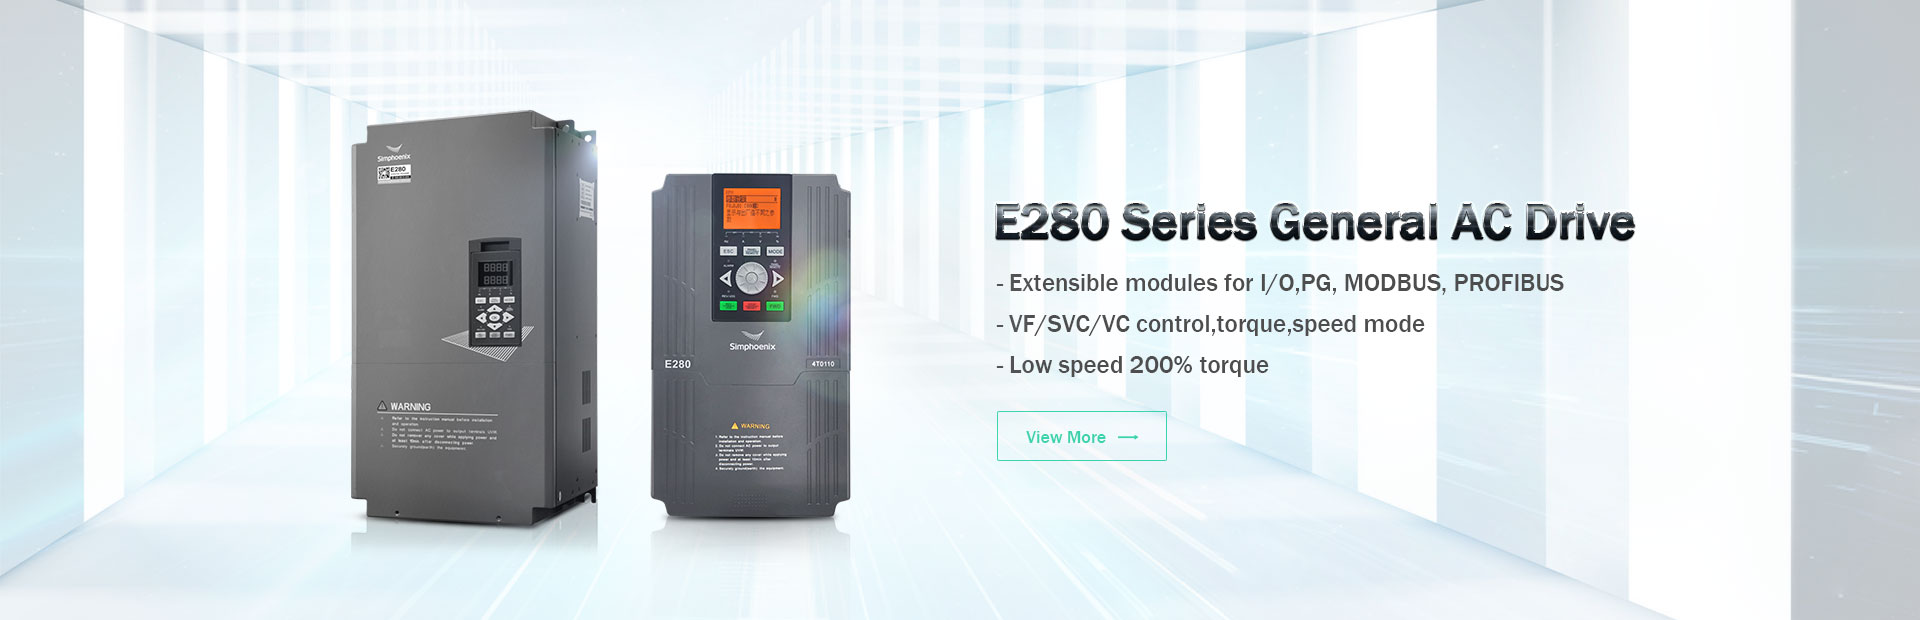 E280-Series-General-AC-Drive1